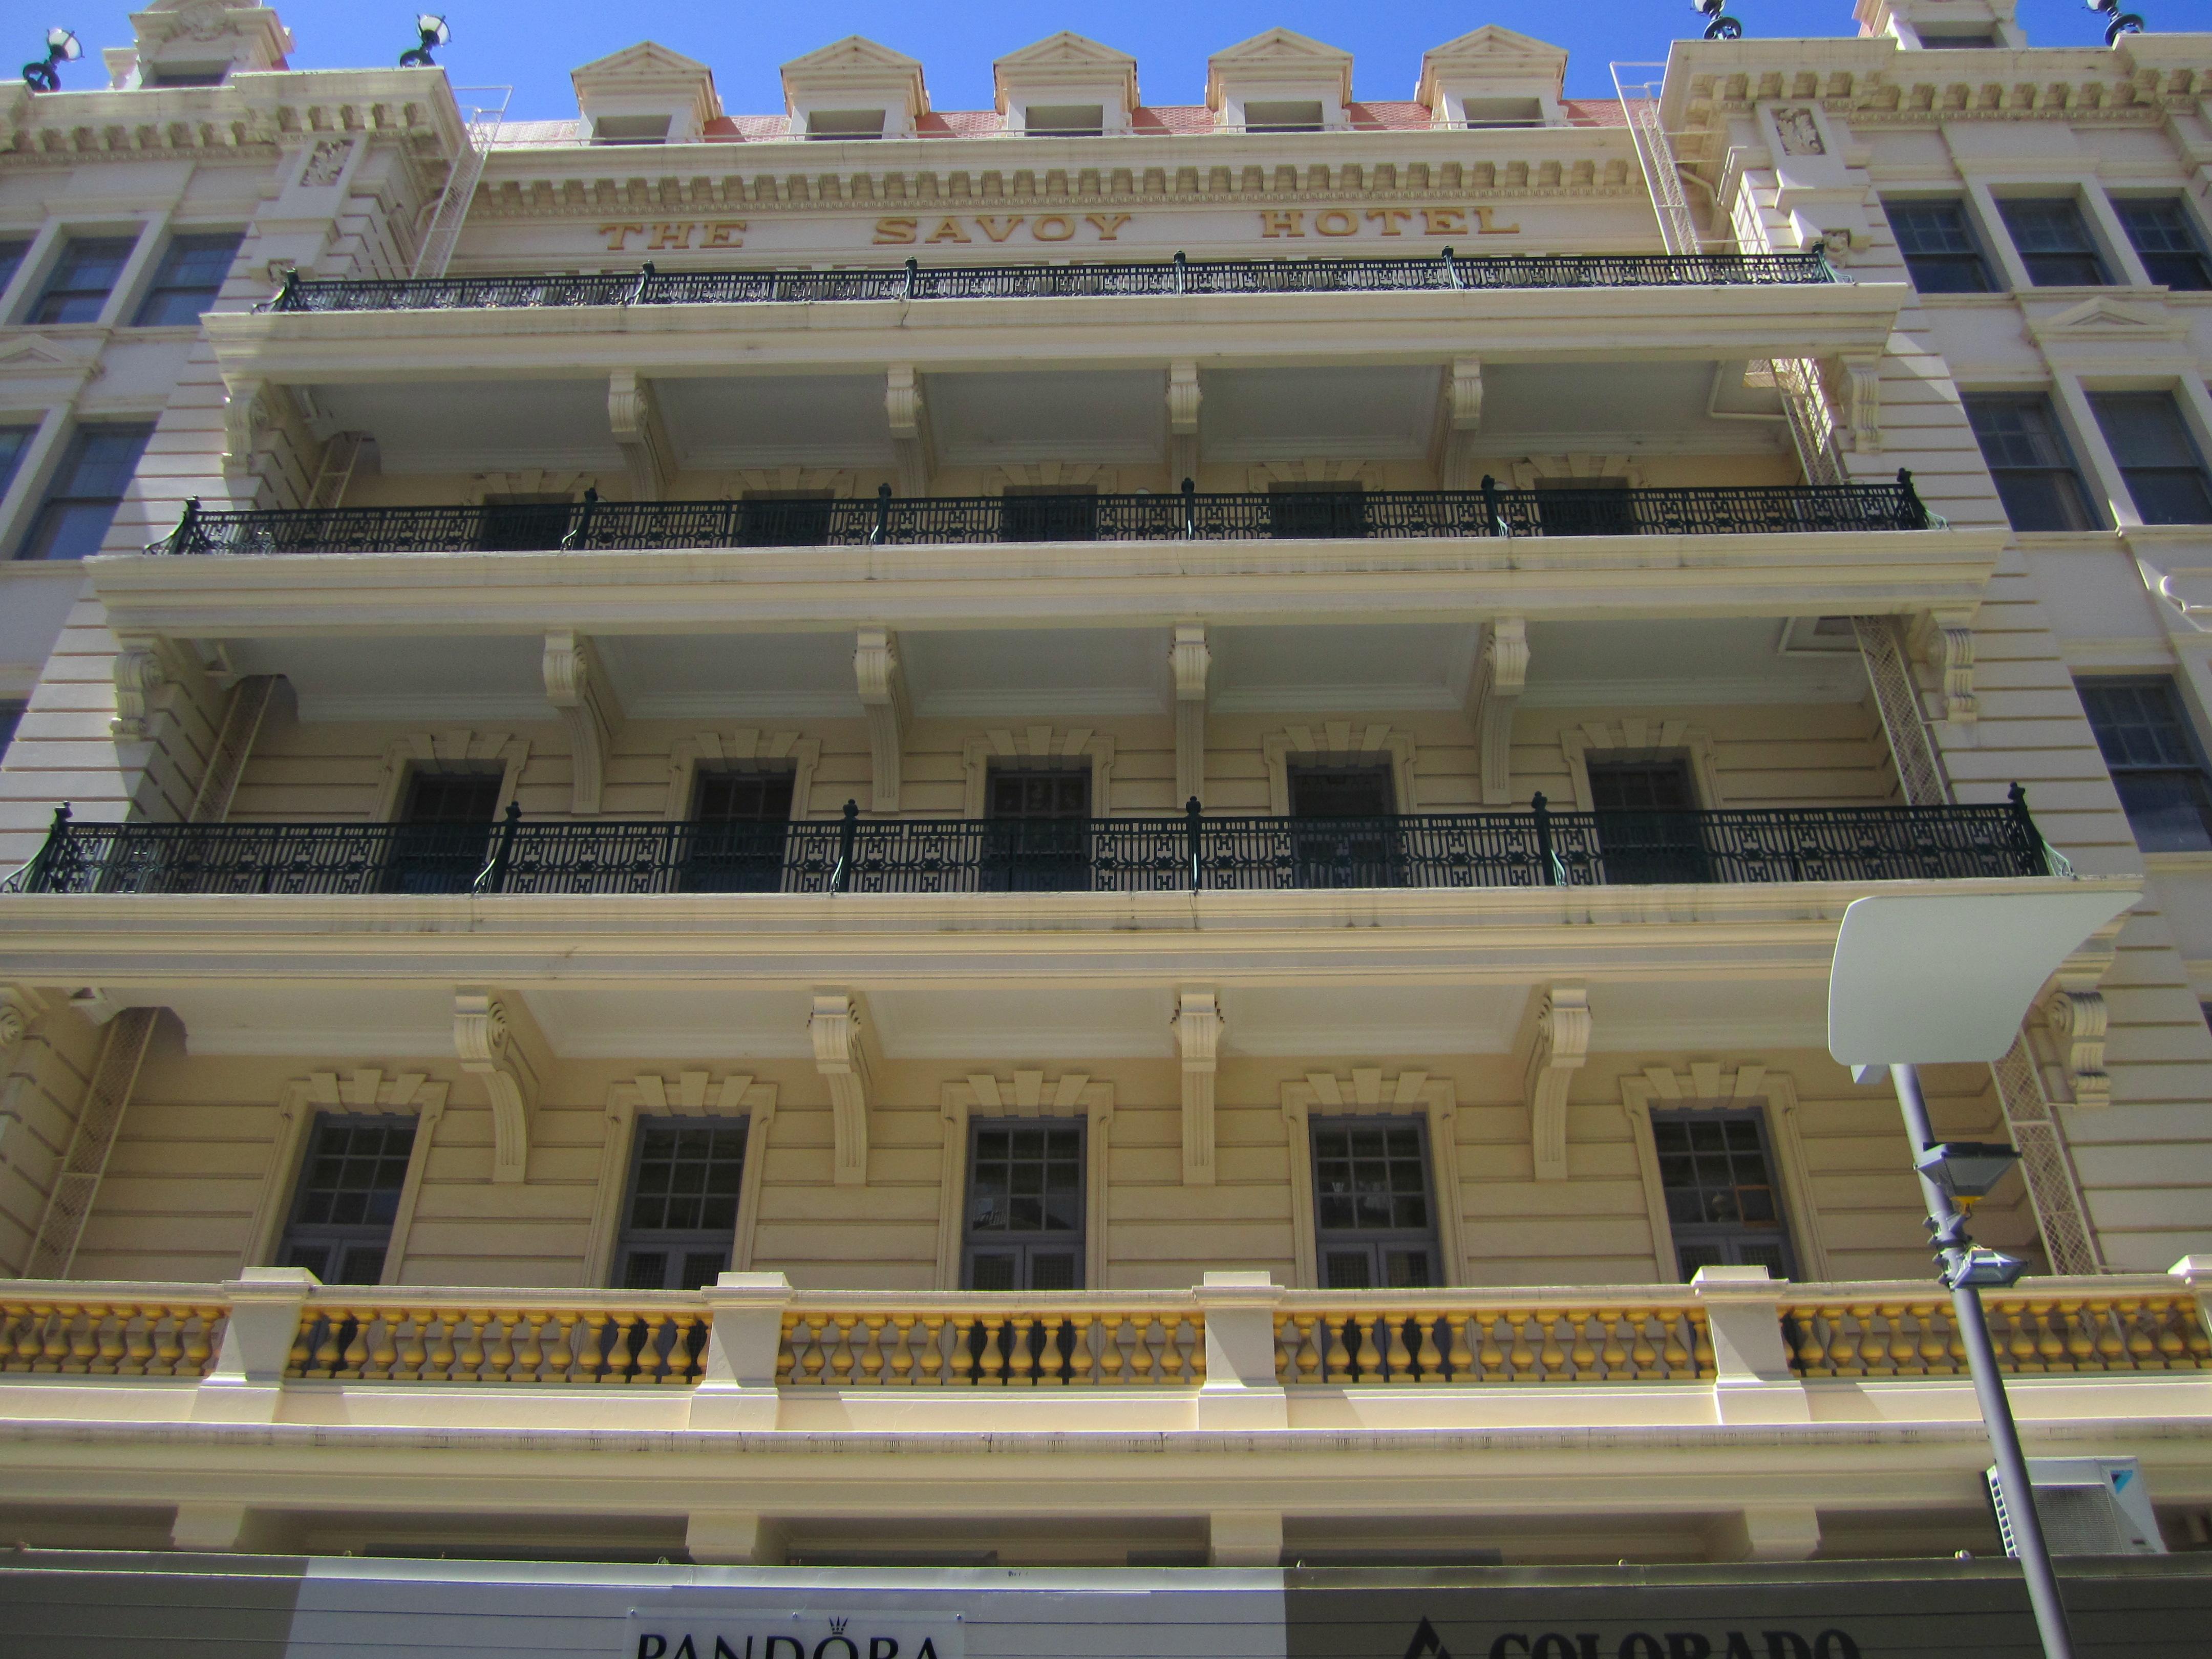 Front view of balconies